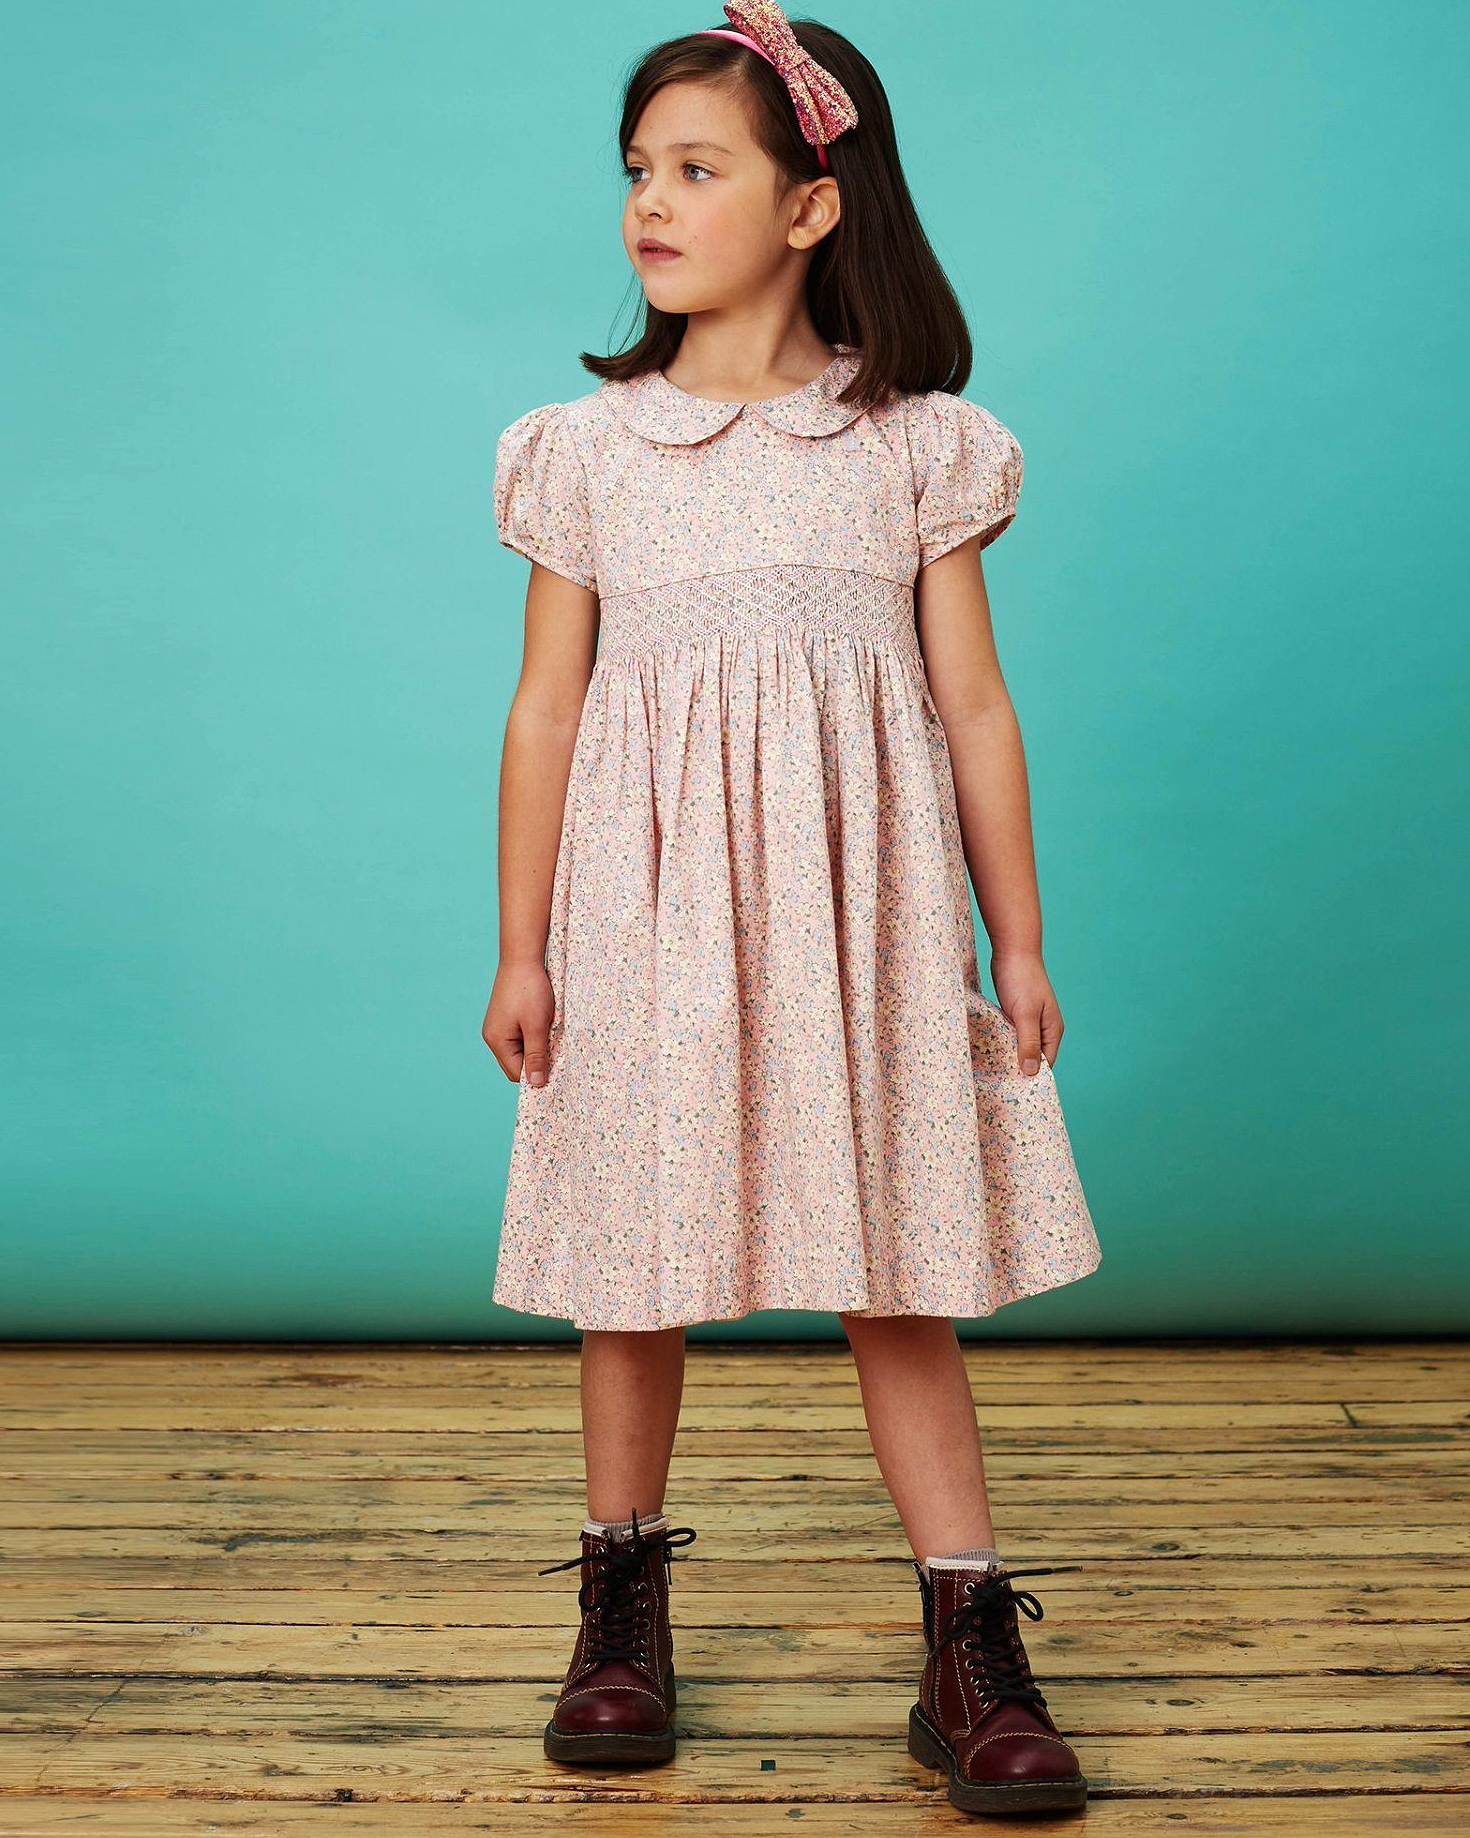 summer flower girl outfit cap sleeved patterned dress